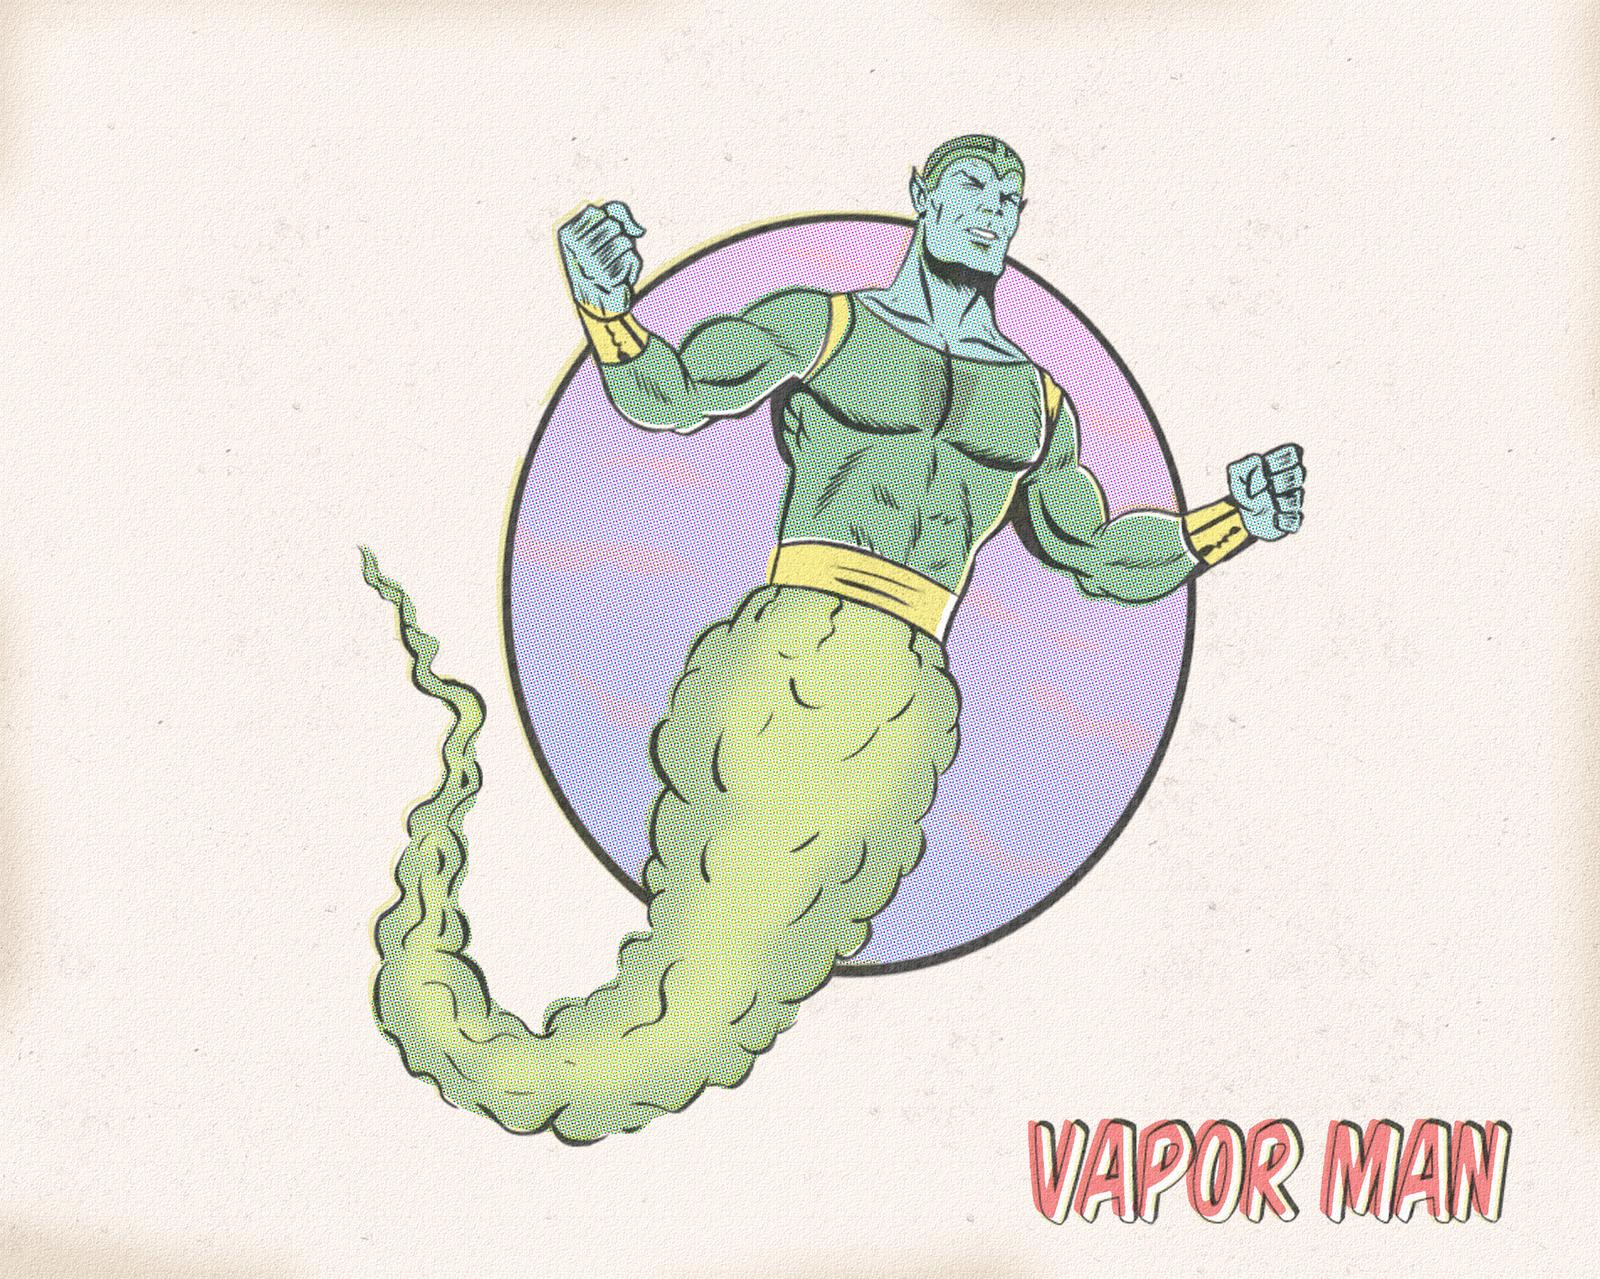 VAPOR MAN by paintmarvels